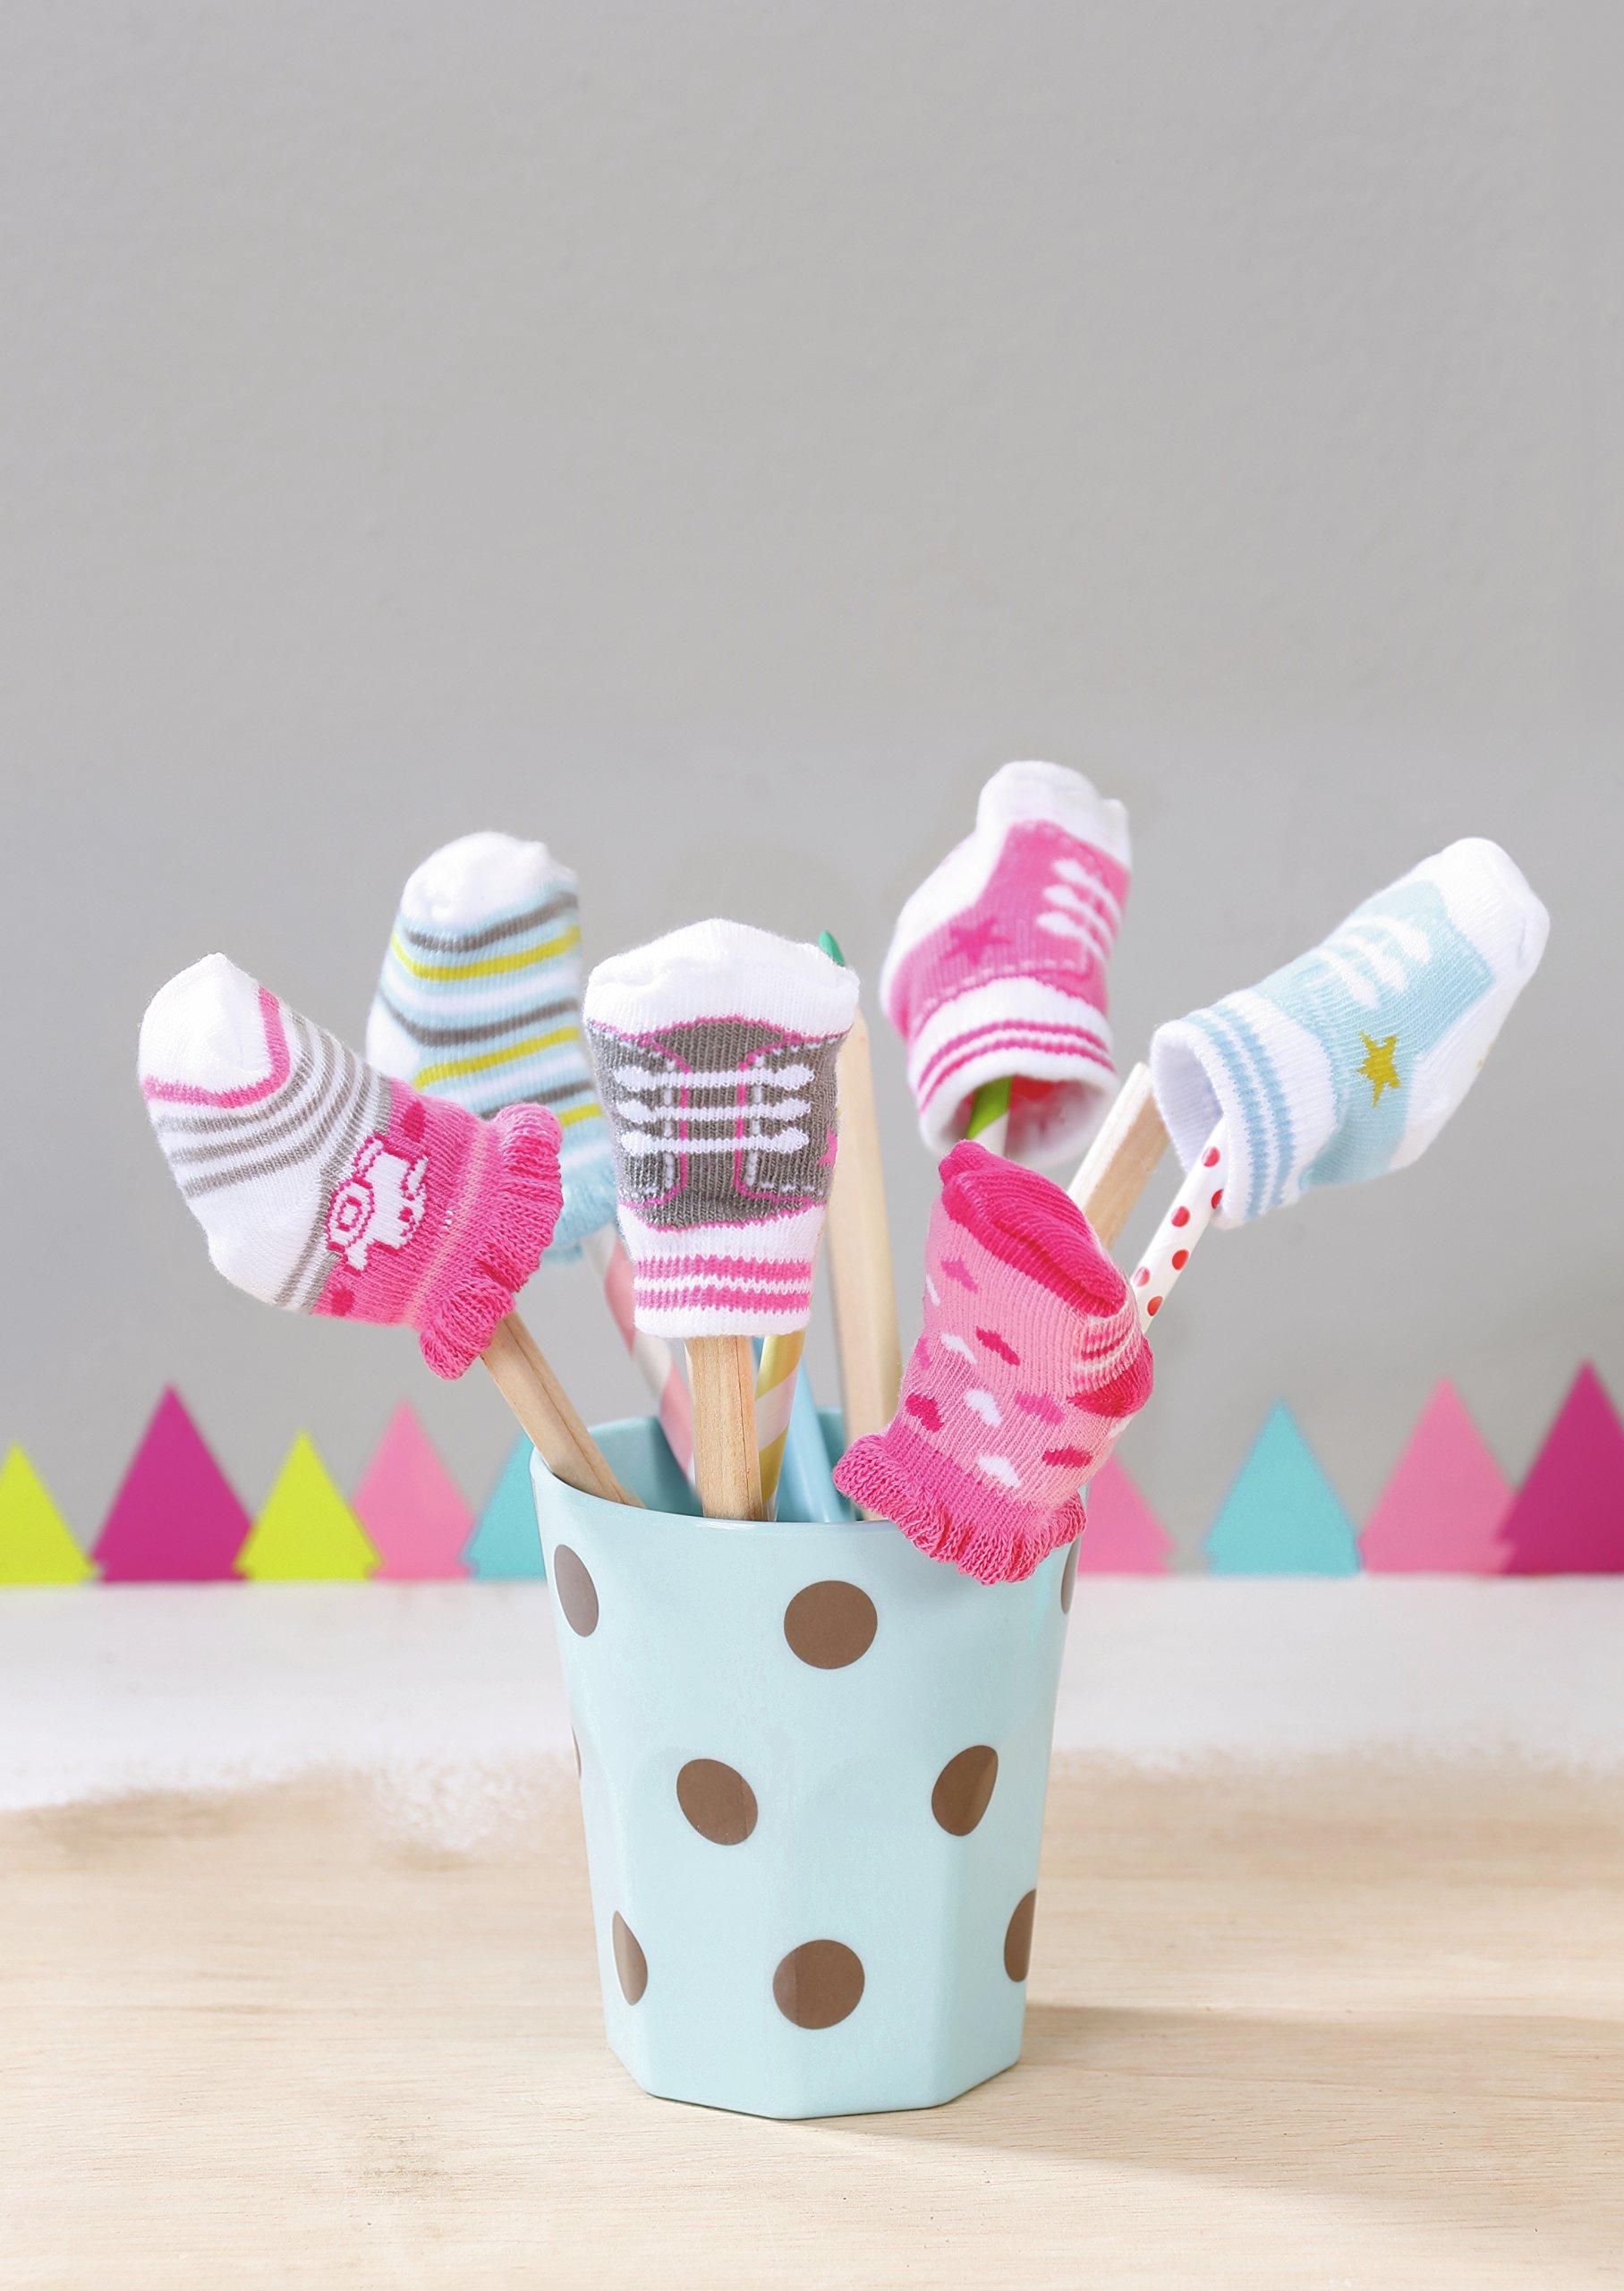 BABY born Socks, 2 pack Calcetines de muñeca - Accesorios para muñecas (2 pack, Calcetines de muñeca, 3 año(s… 2